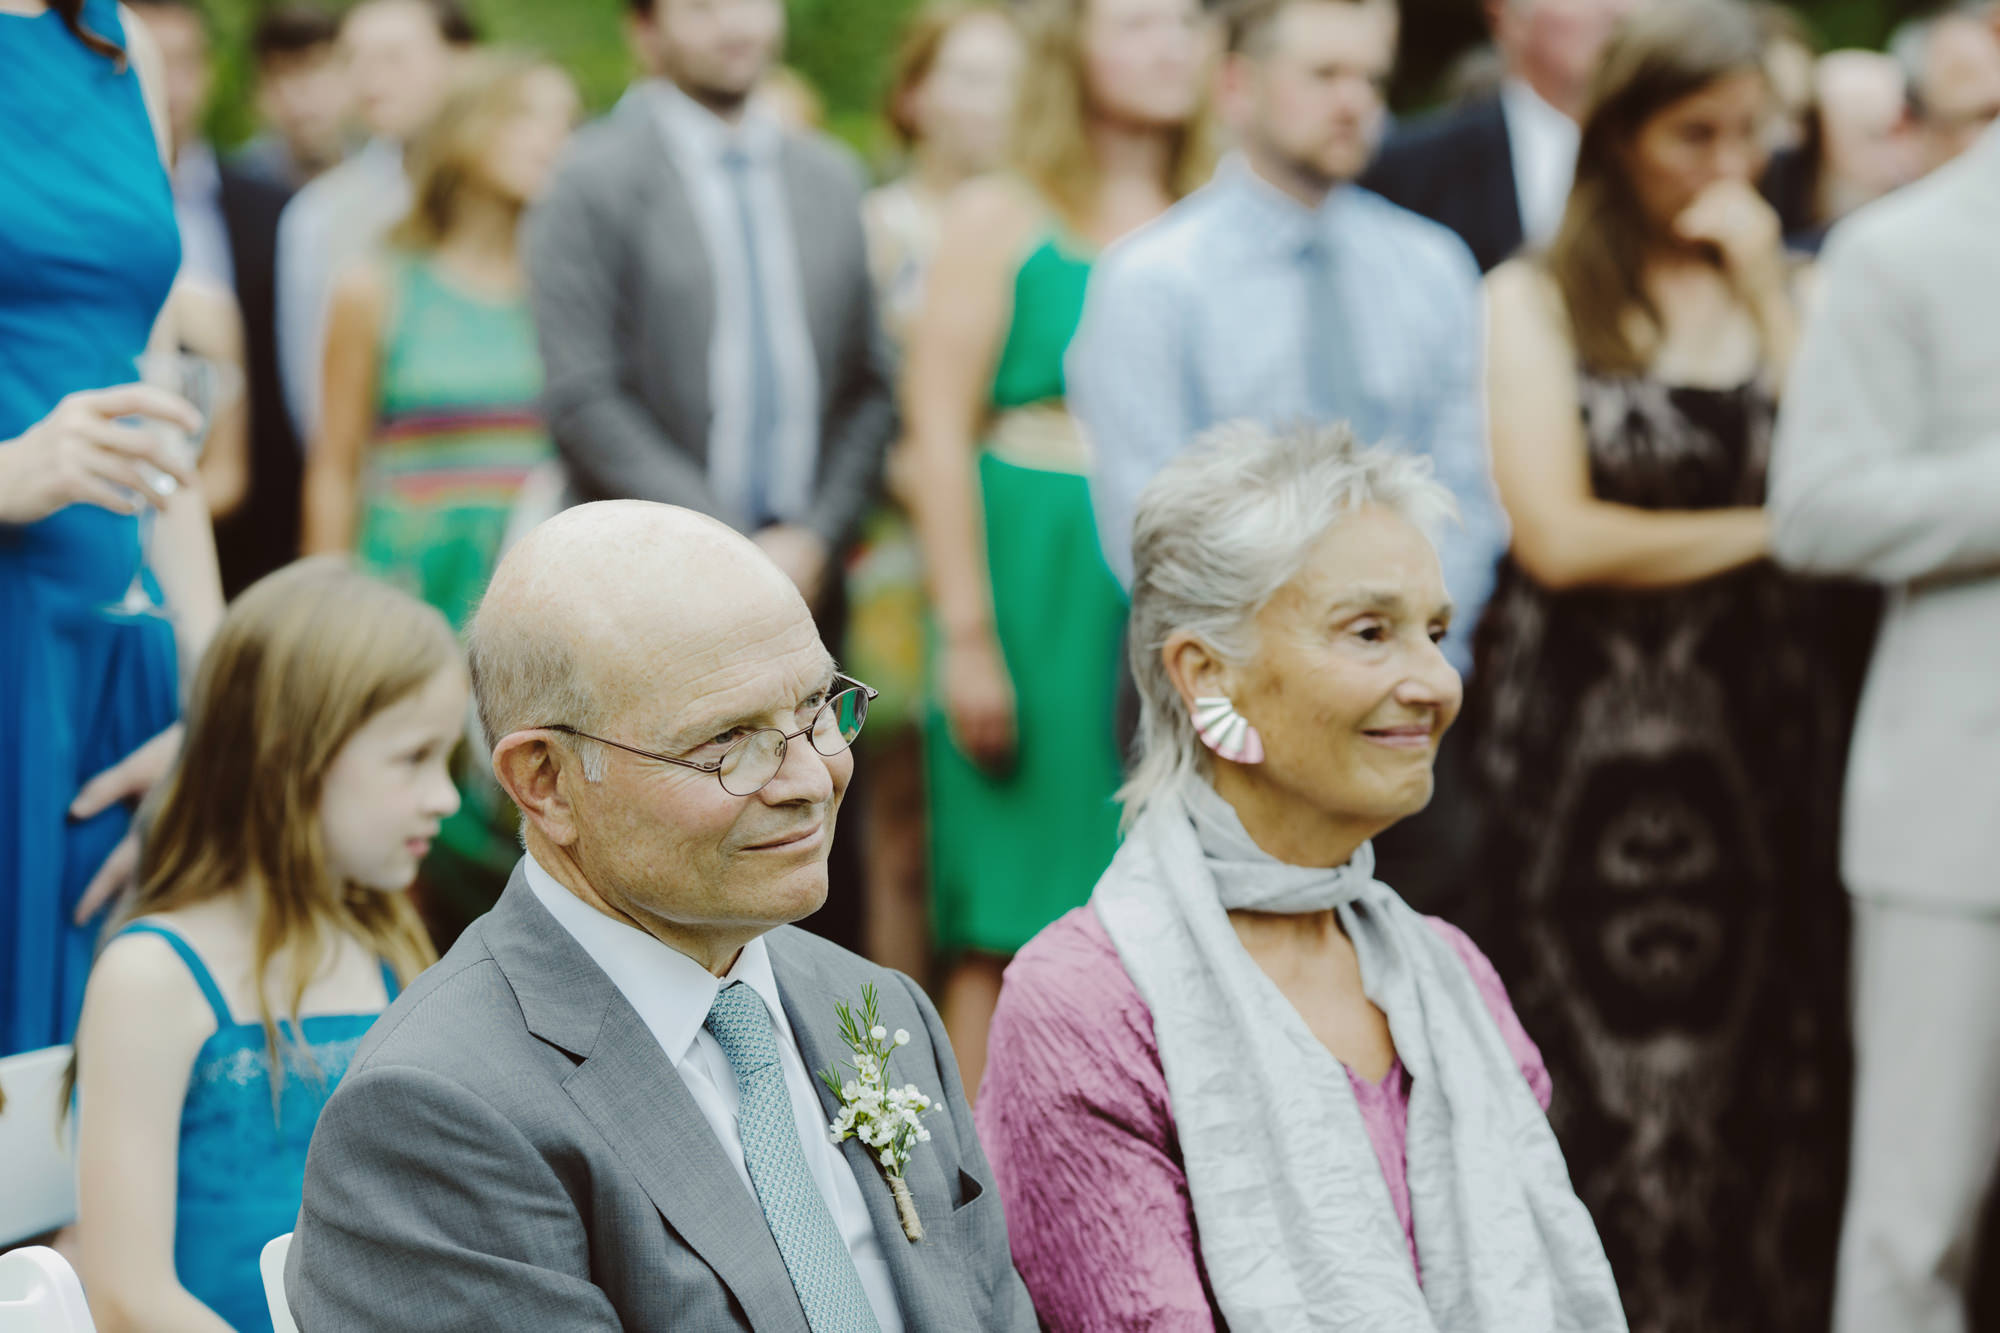 catskills_big_indian_springs_upstate_NY_wedding_sammblake053.jpg